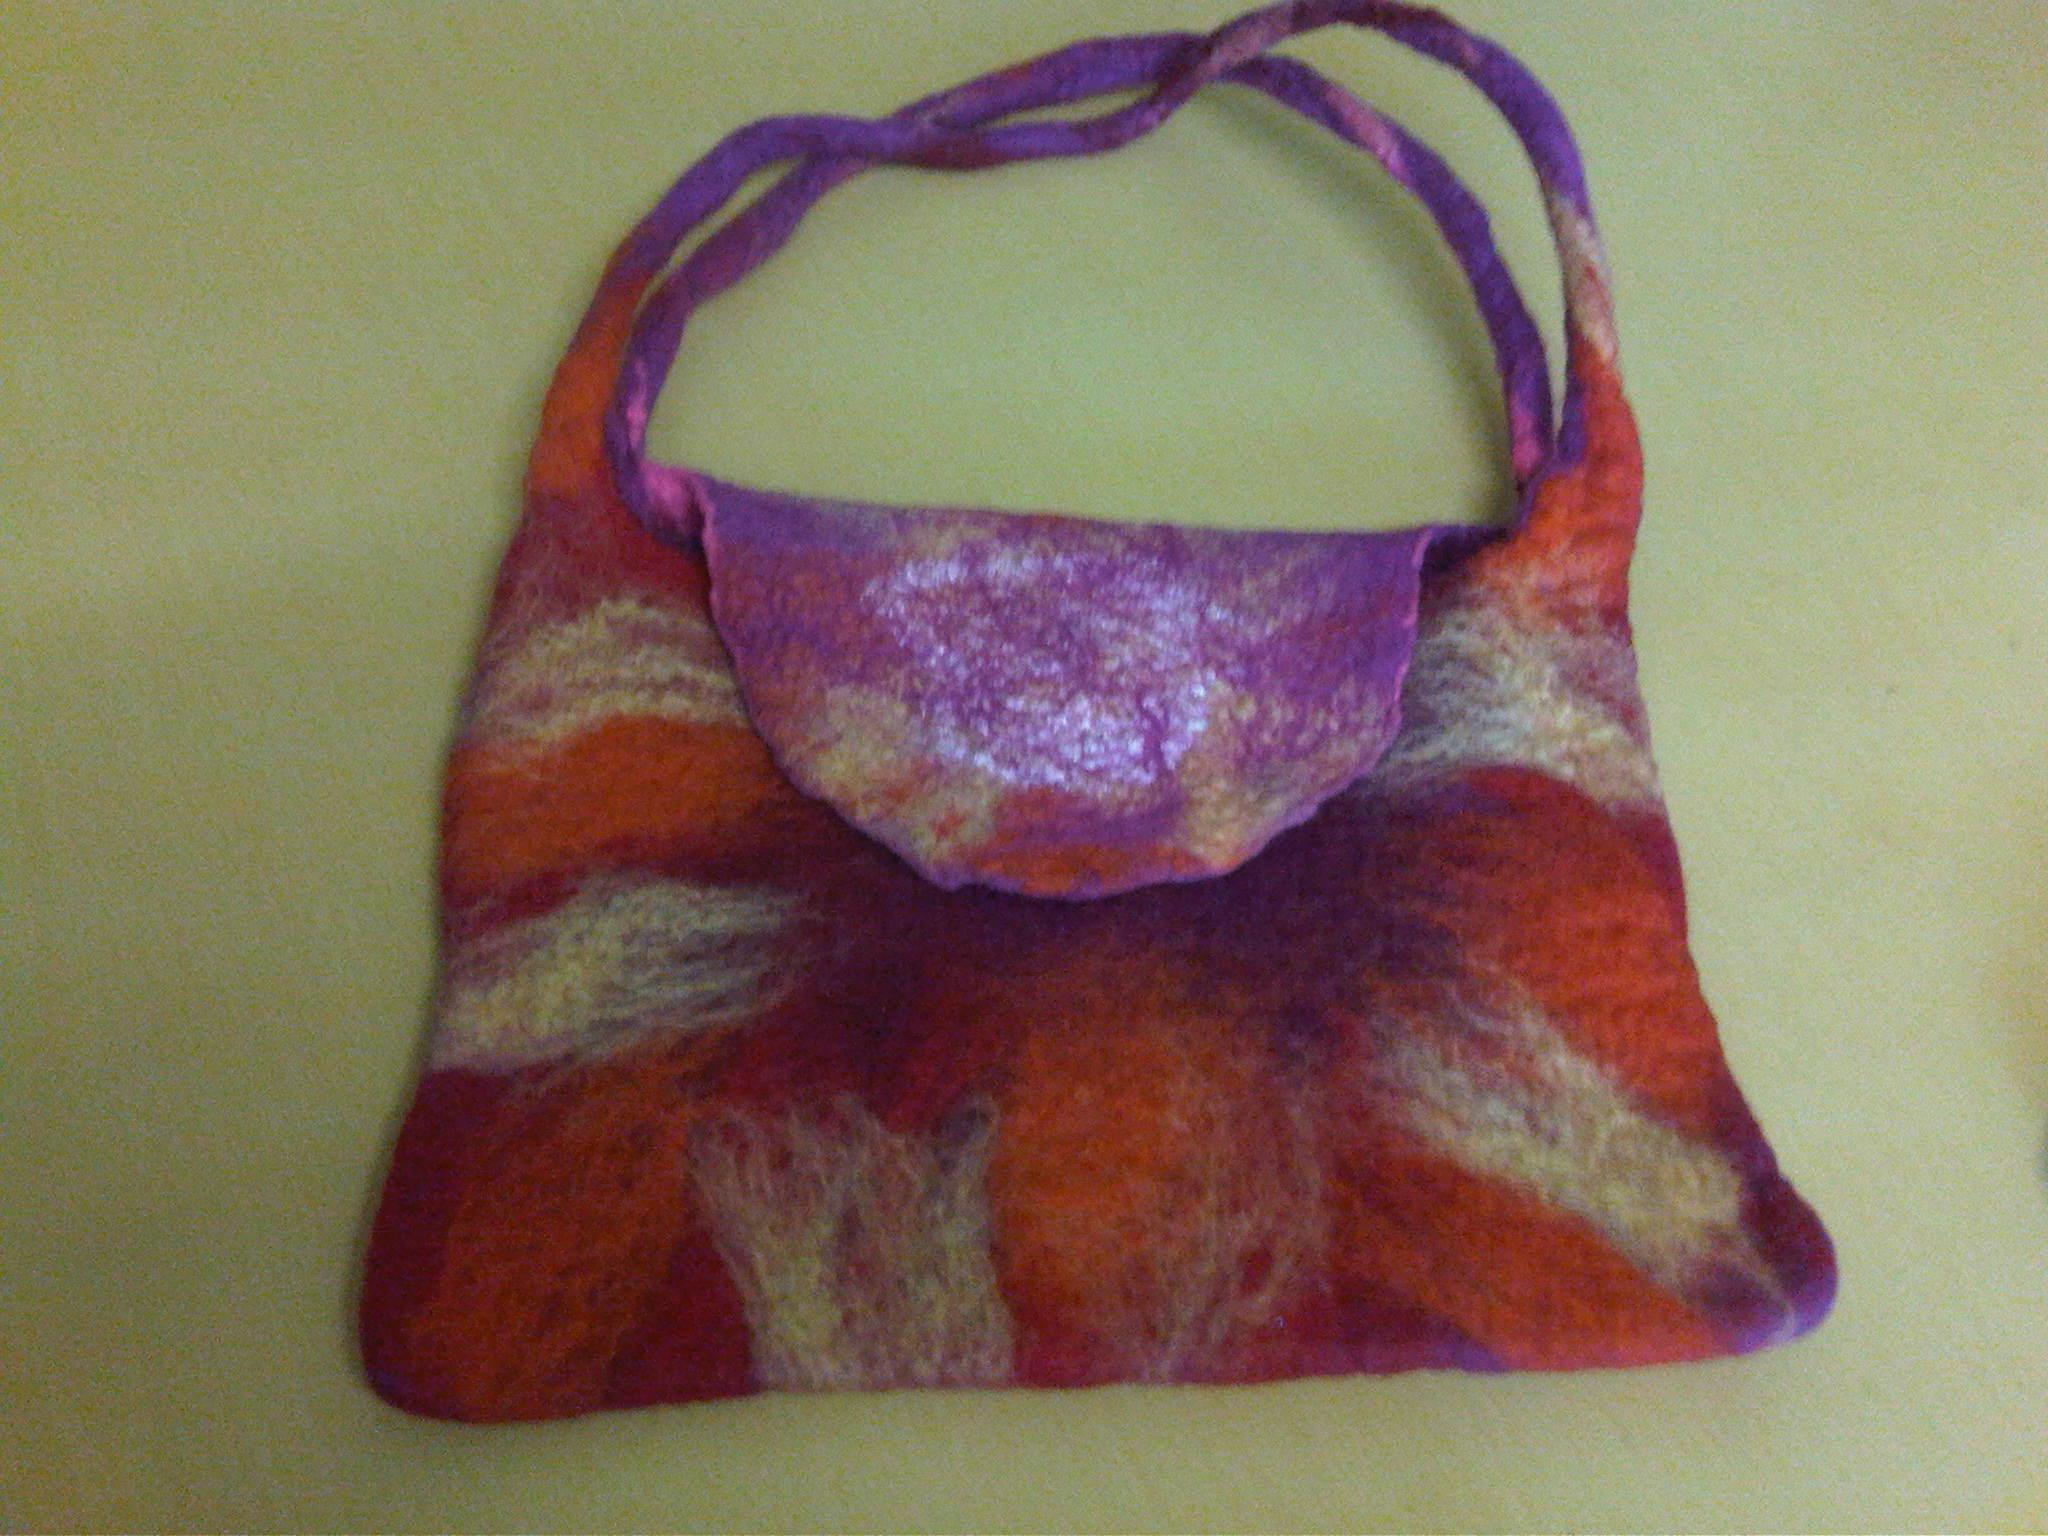 bag - for sale